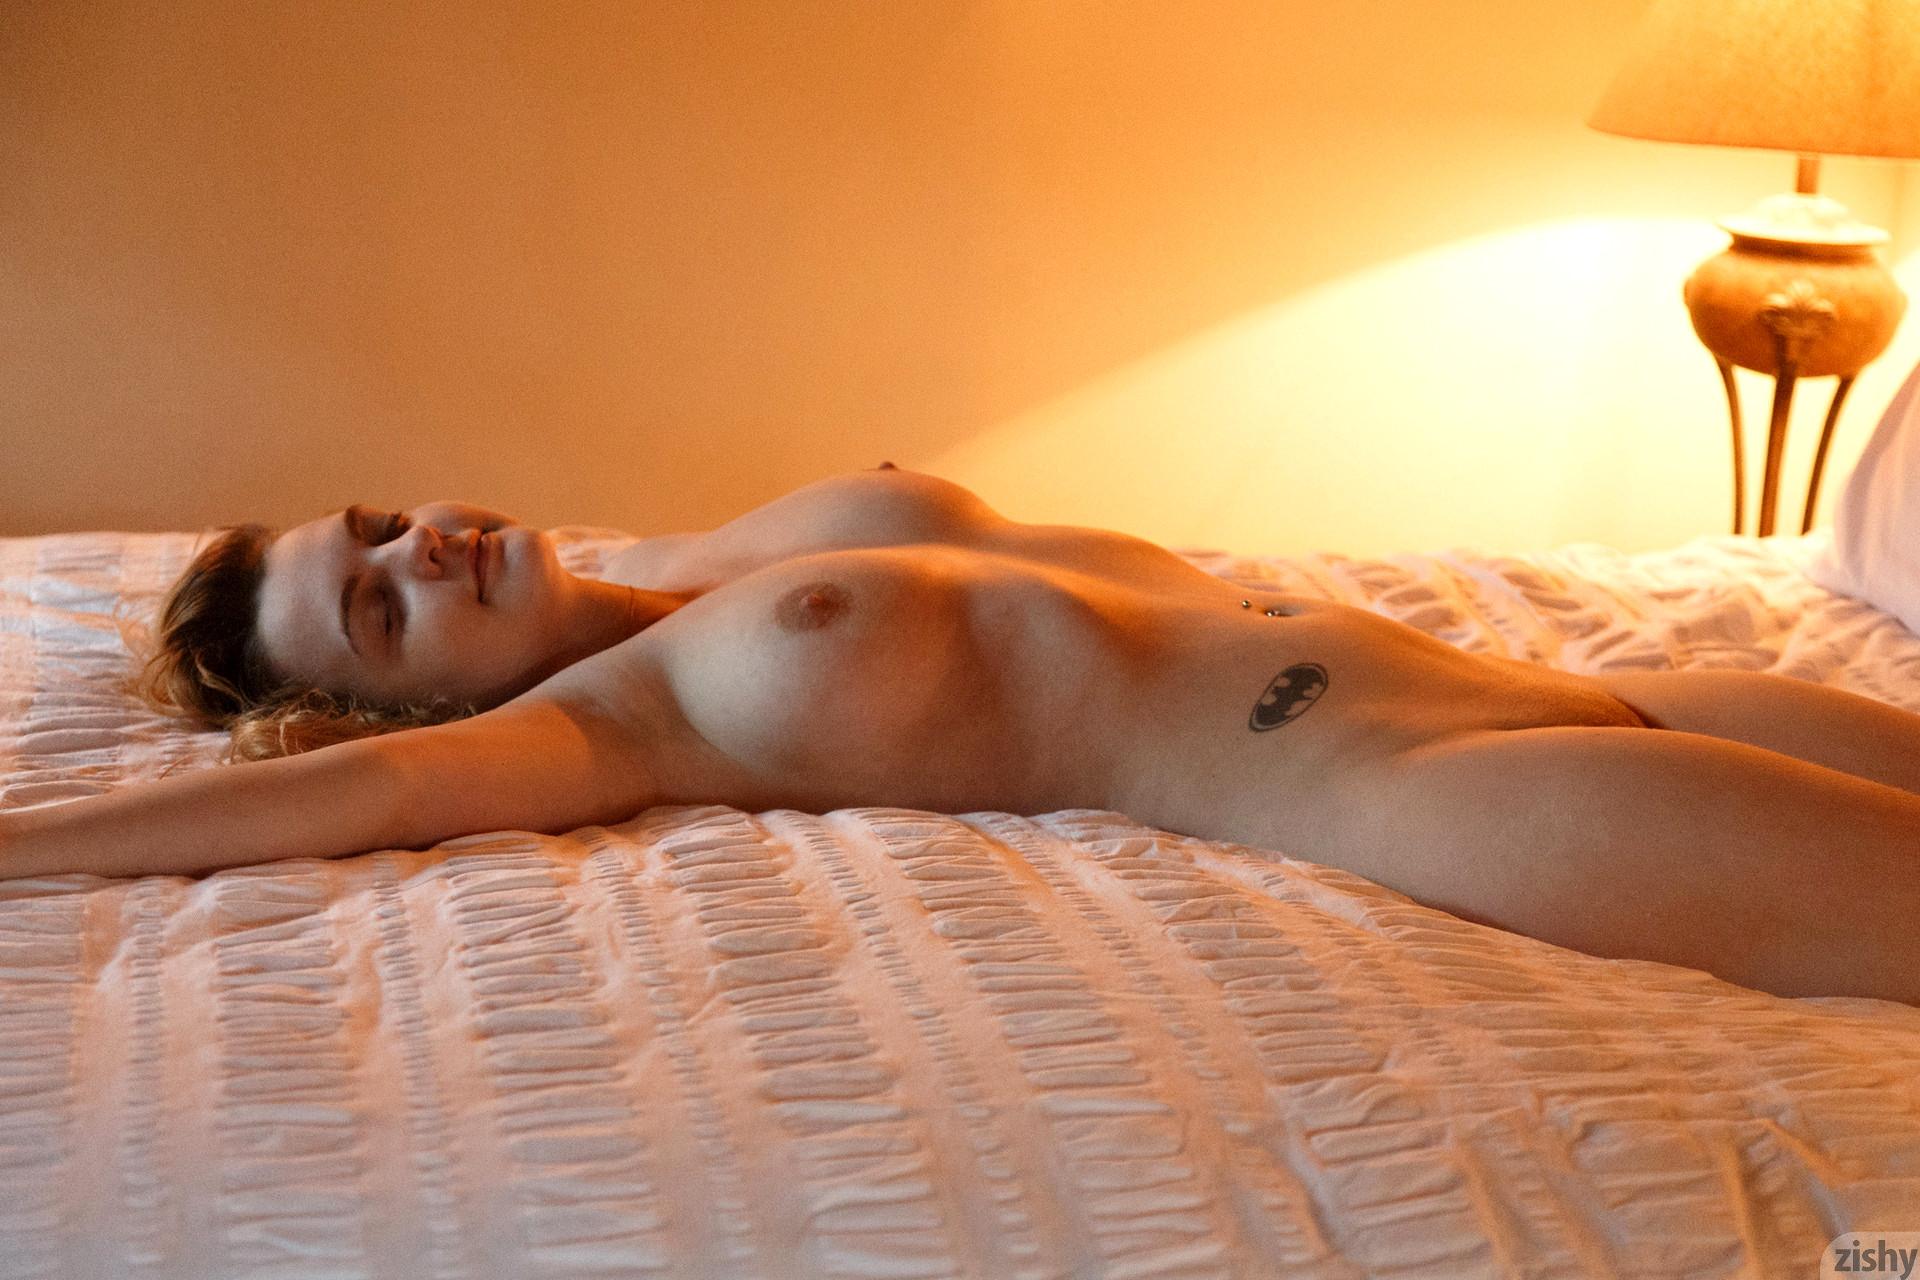 riley reid pantyhose